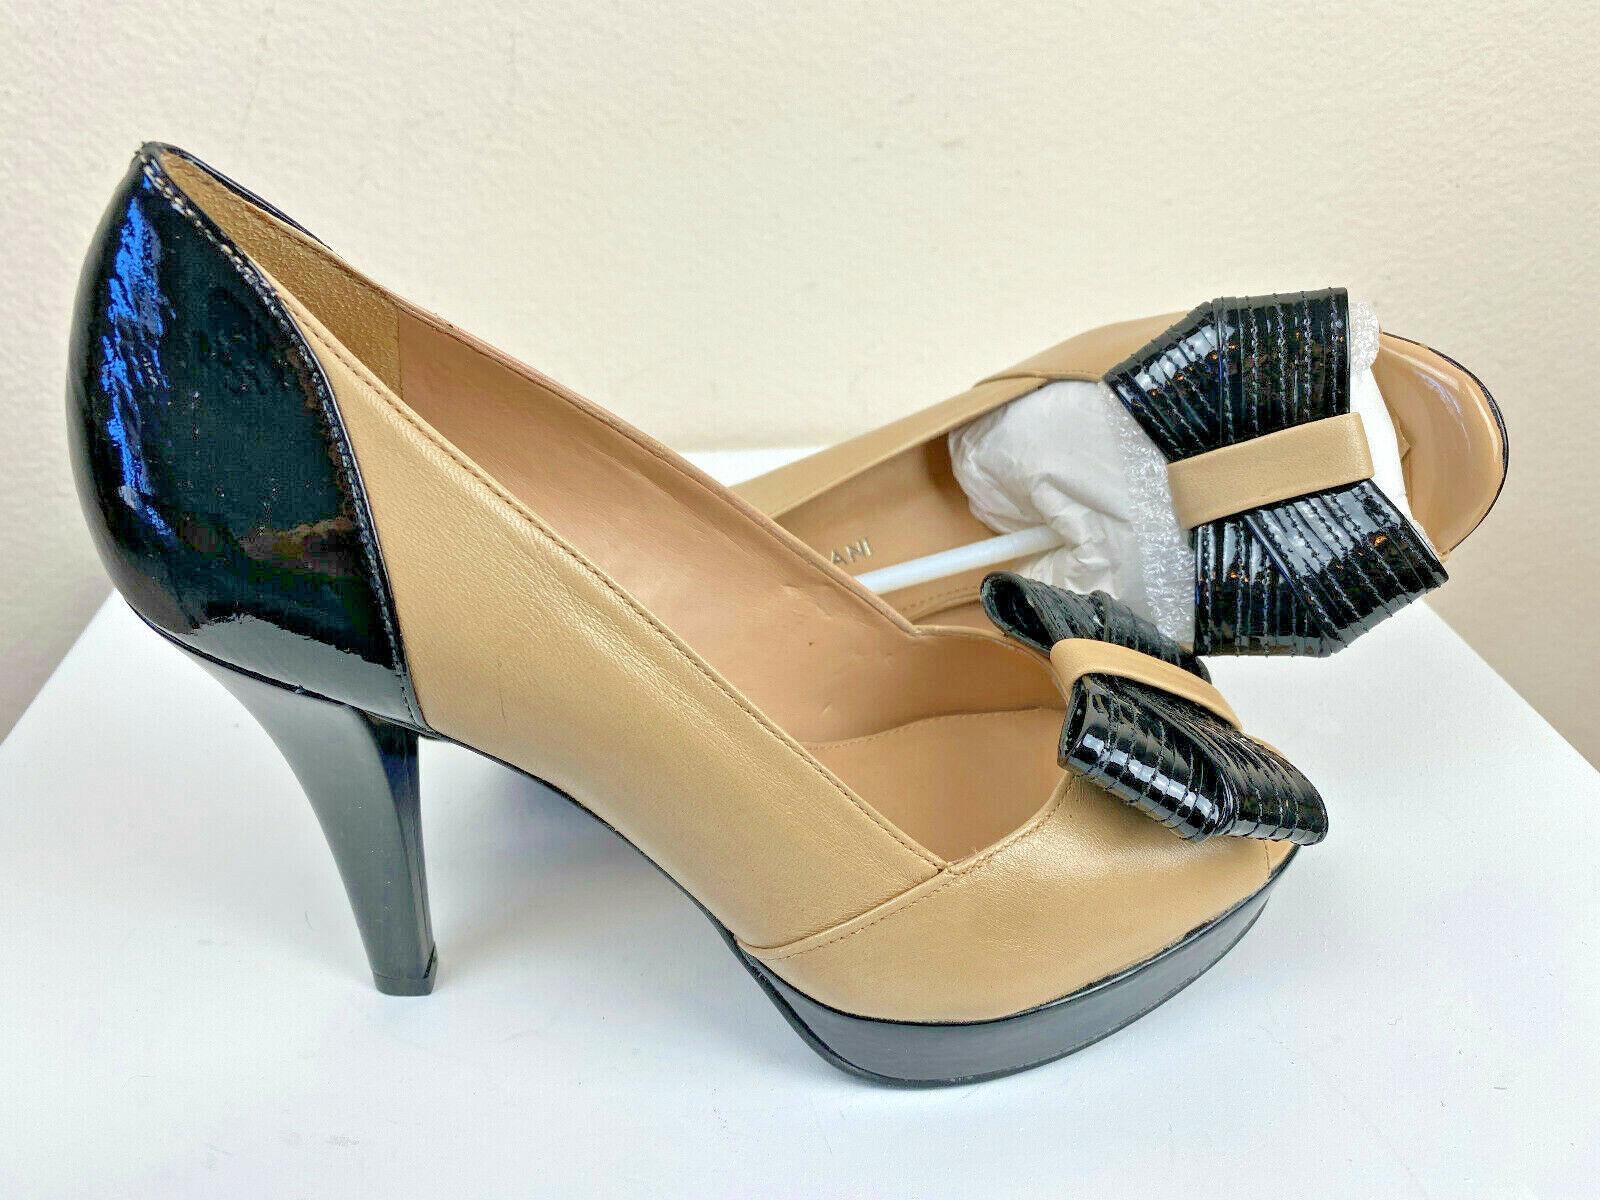 Antonio Melani Platform Pump Peep Toe 7M Nude Leather Stiletto Bow Top